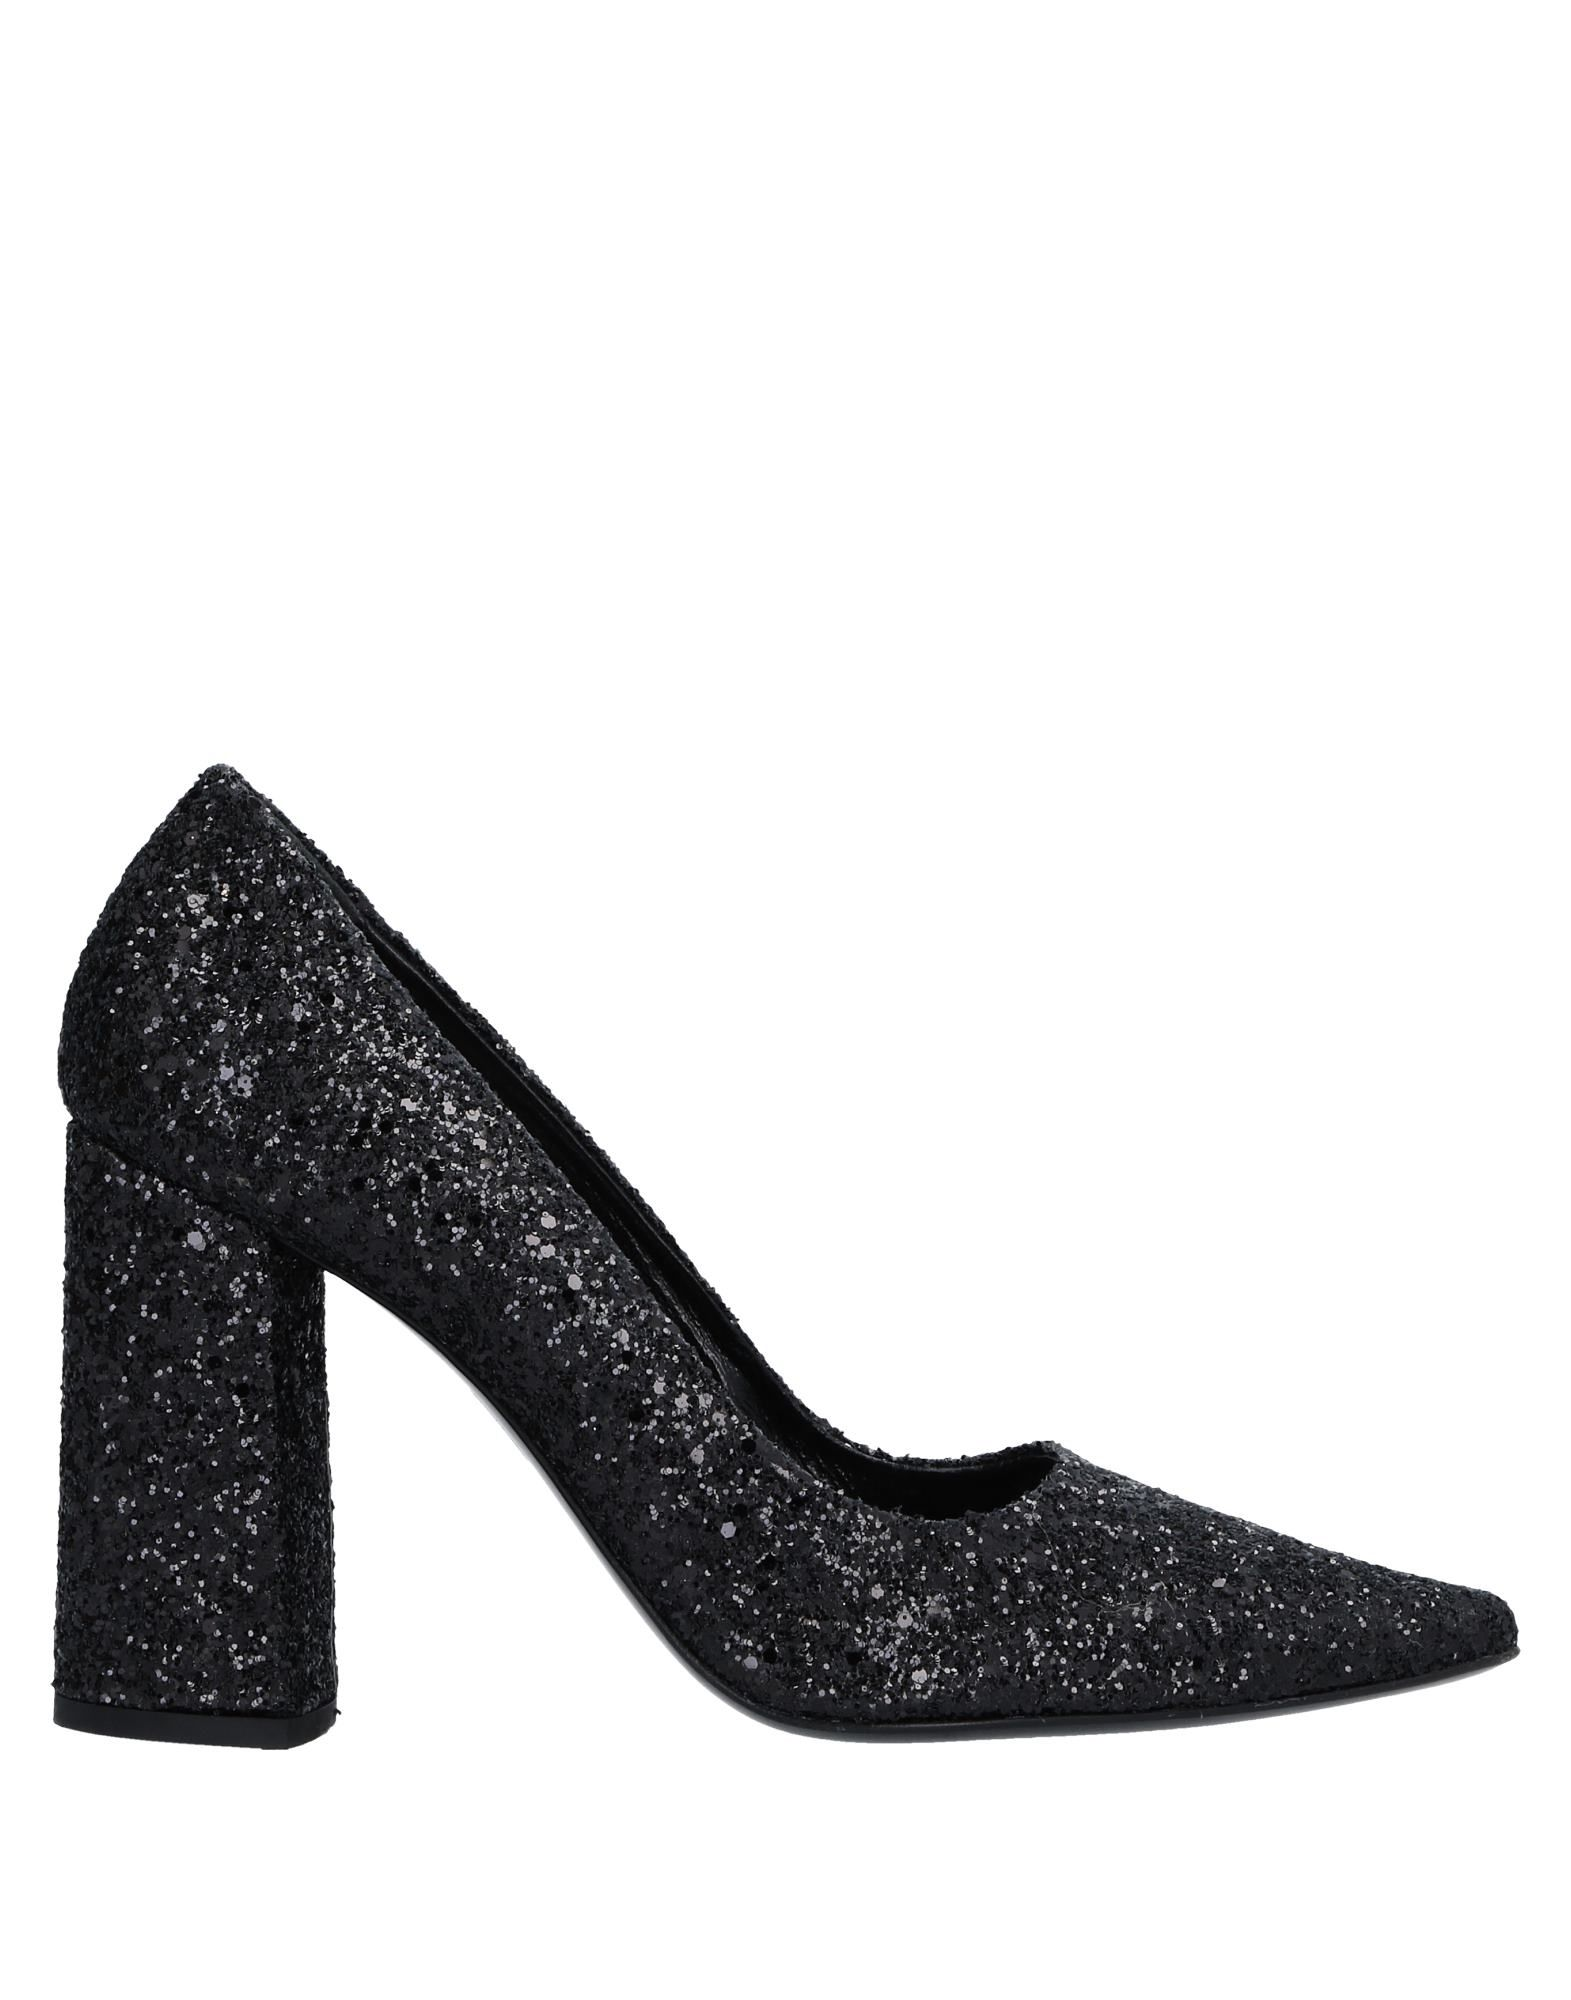 Sandali Nuove Tiffi Donna - 11467382PX Nuove Sandali offerte e scarpe comode 5f89d1